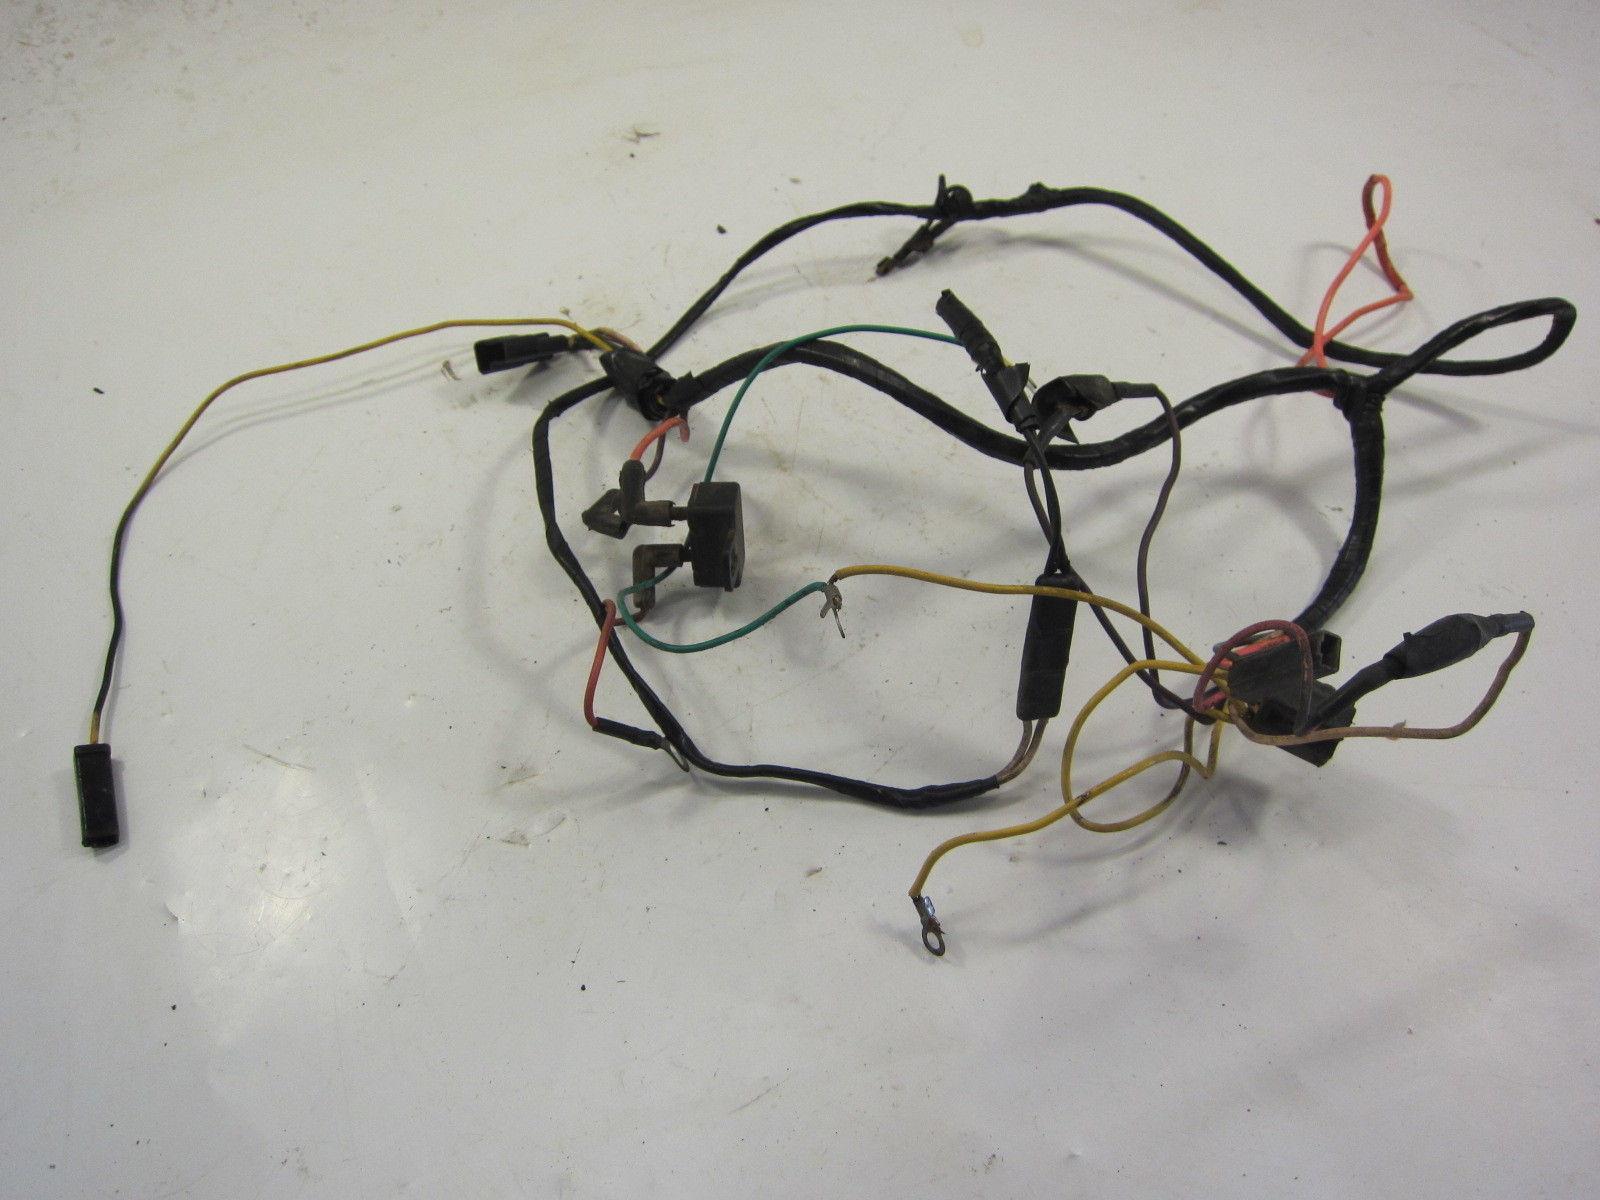 John Deere 210 Wiring Harness Block And Schematic Diagrams 212 Am35101 200 214 216 Parts Schematics